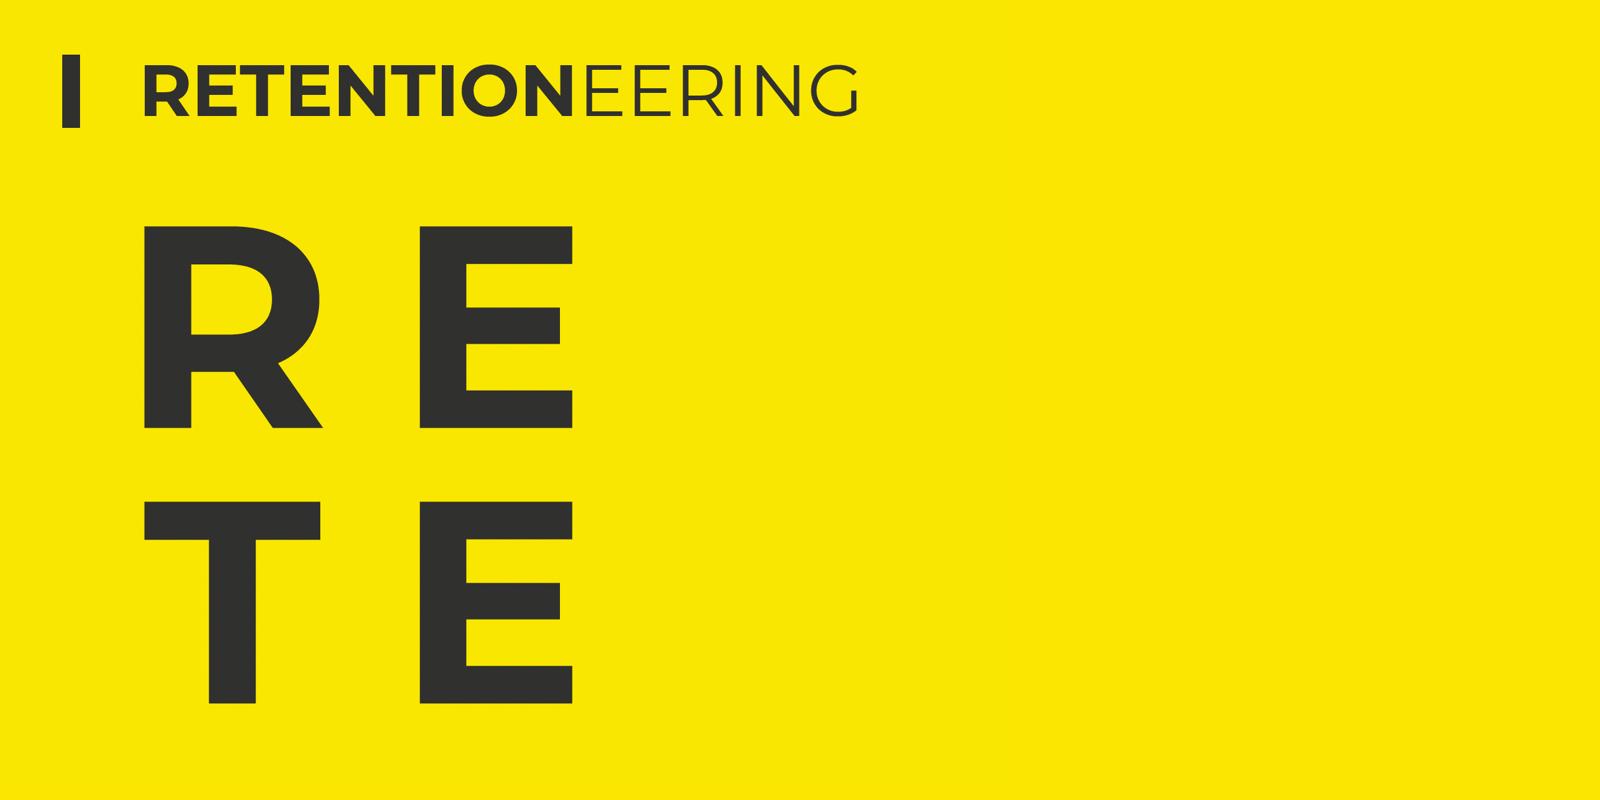 retentioneering-tools